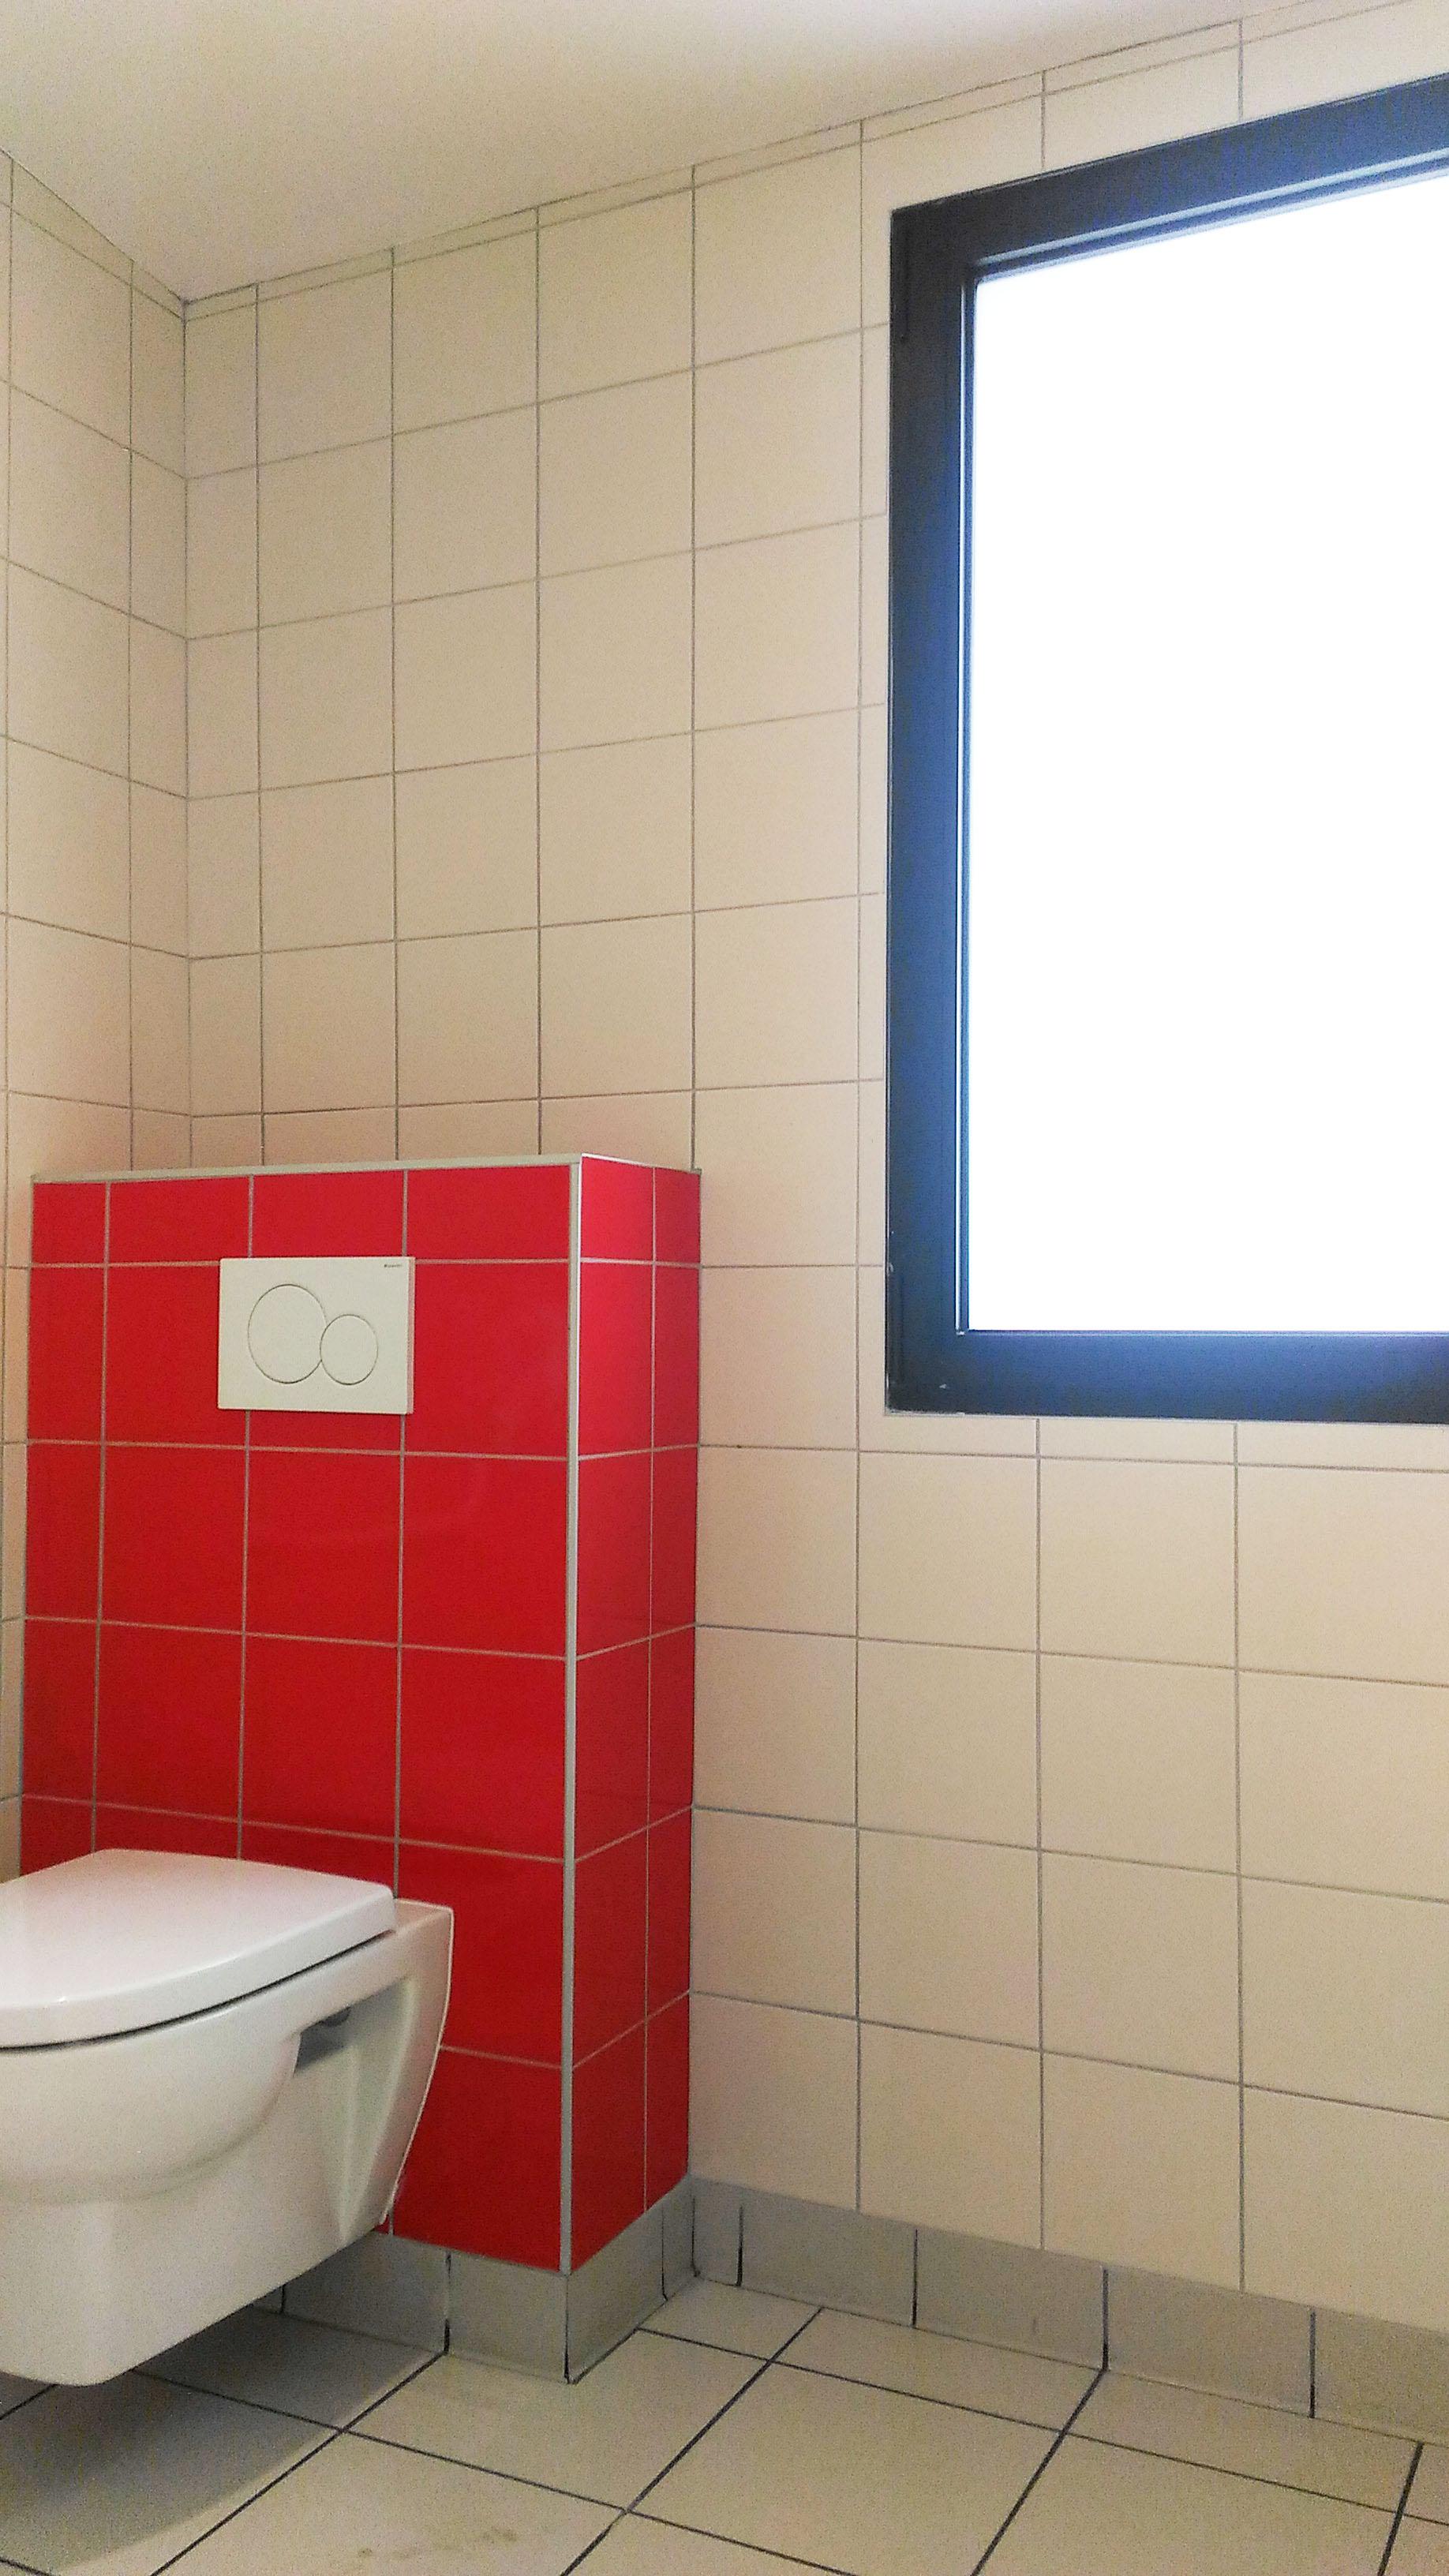 sanitaire public PMR